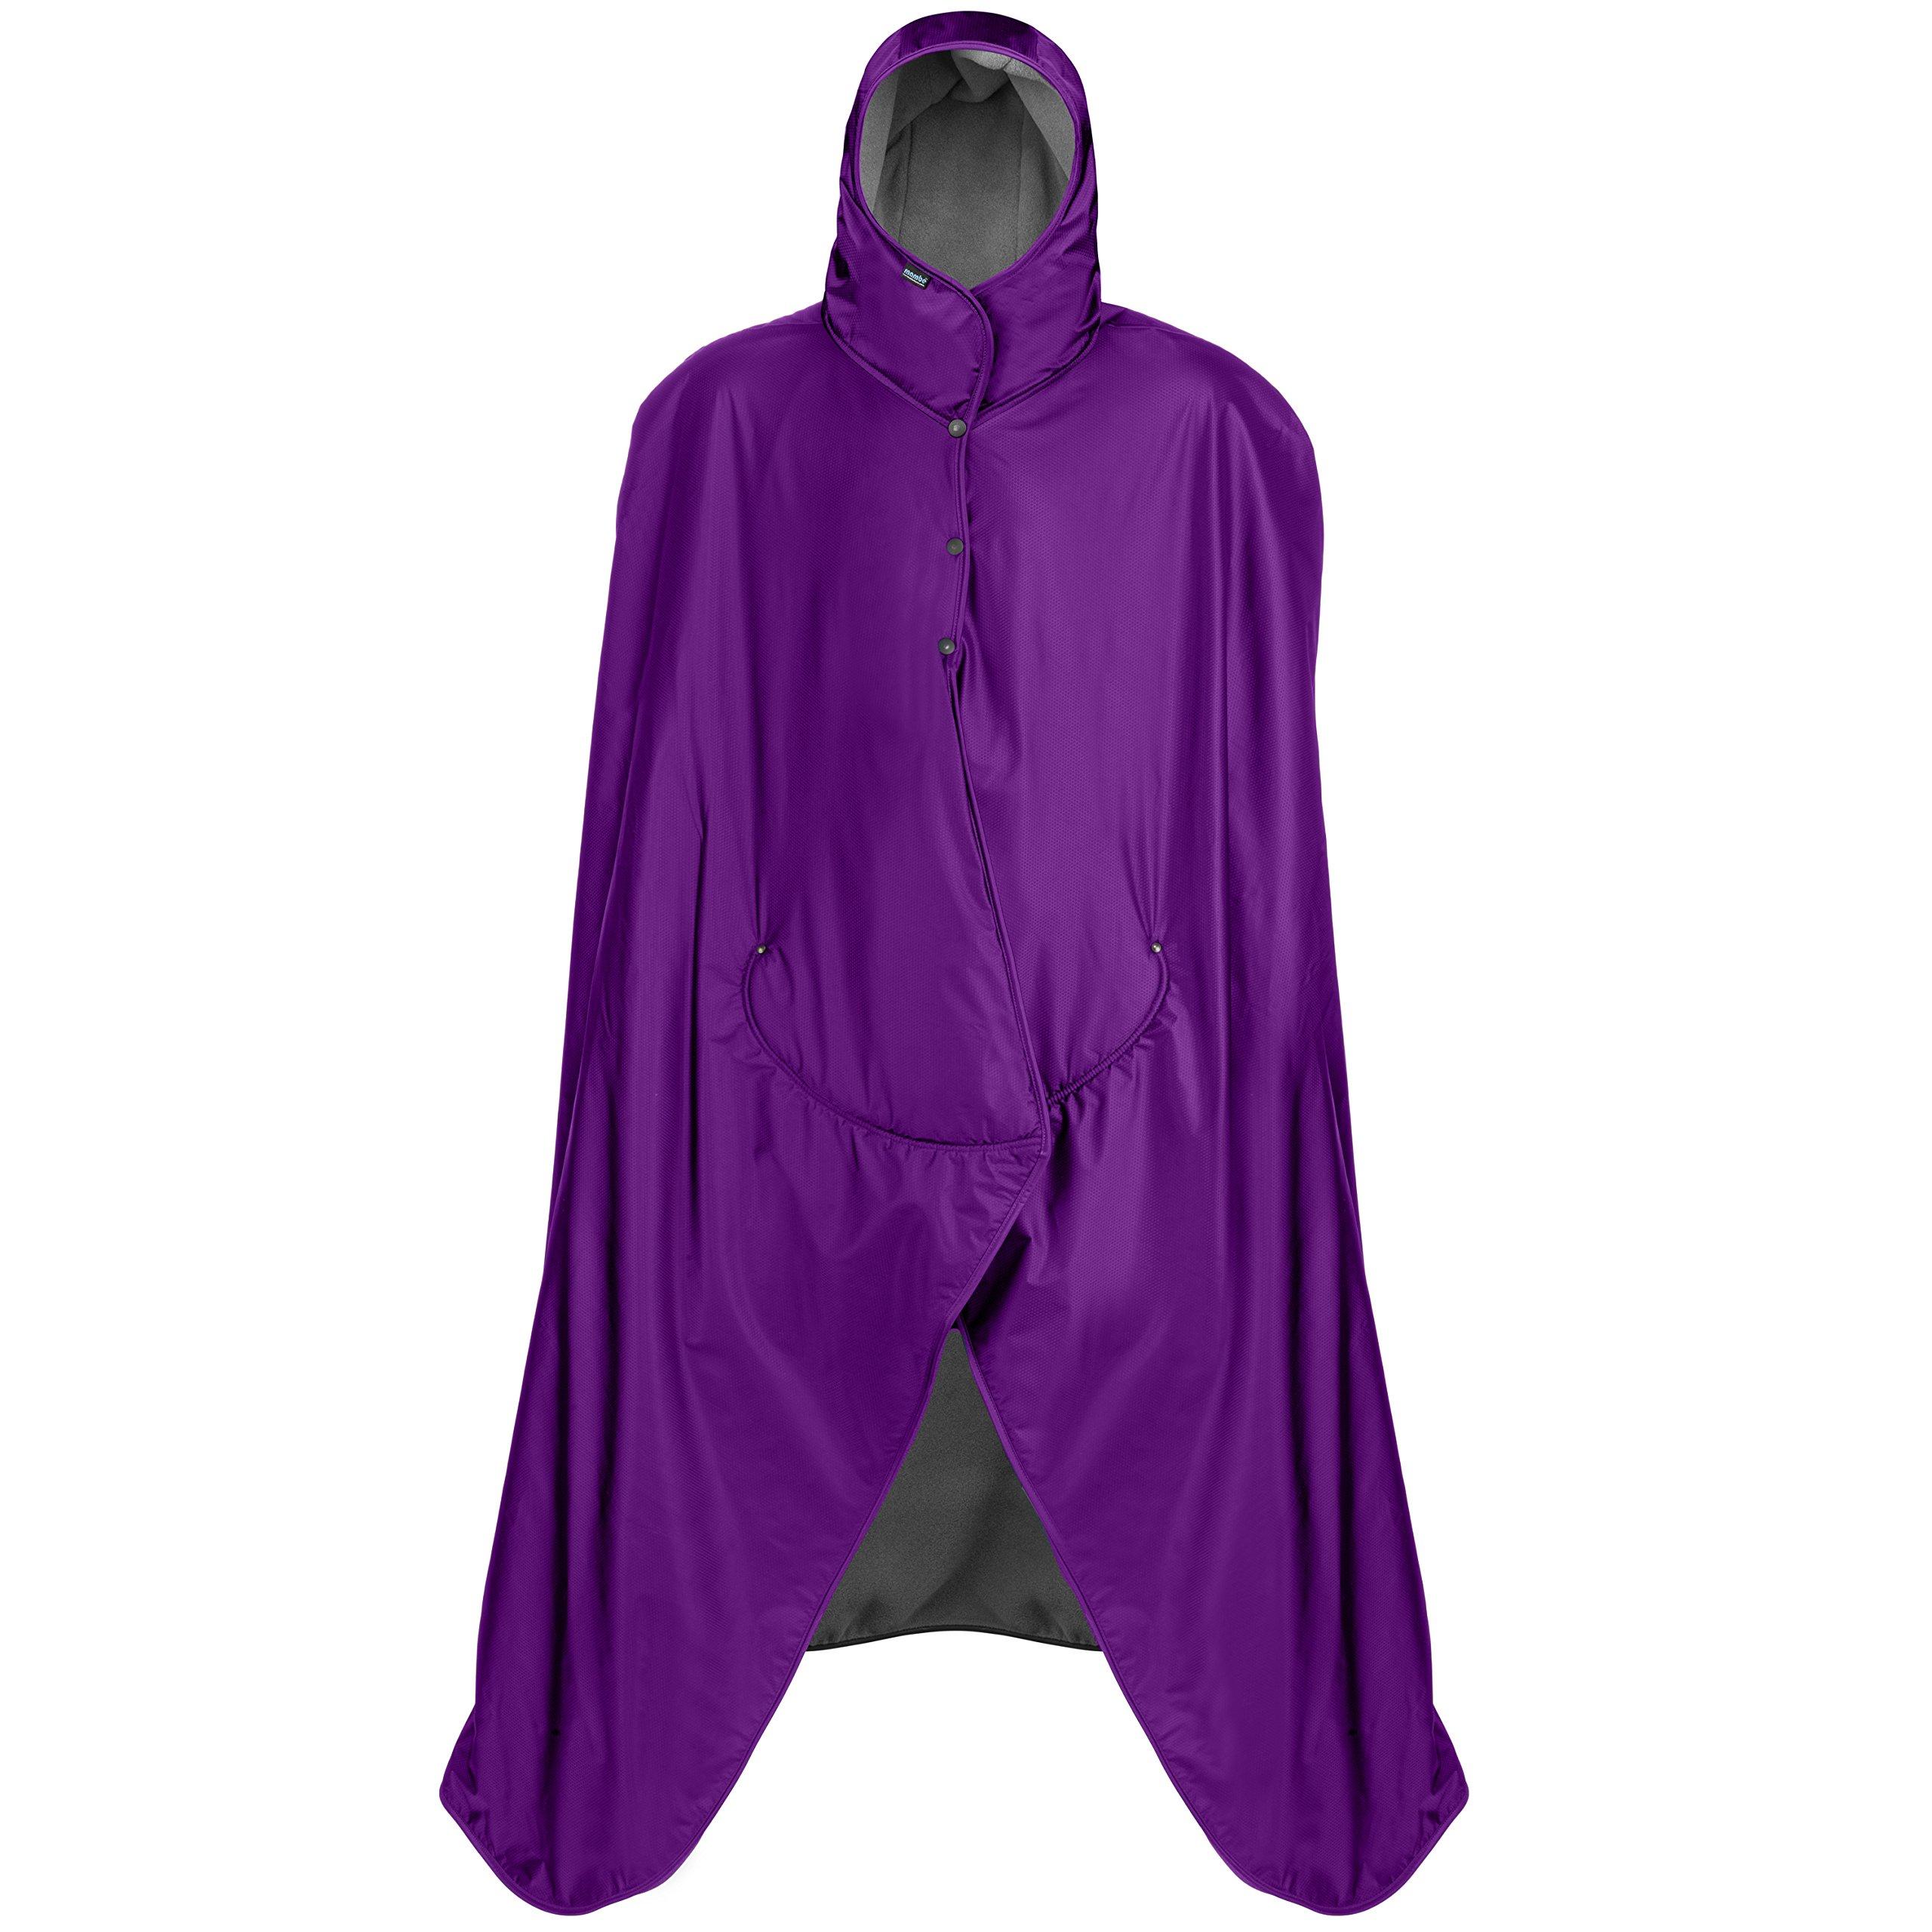 Mambe Extreme Weather 100% Waterproof/Windproof Hooded Blanket with Premium Stuff Sack (Size: Regular, Purple-Charcoal)